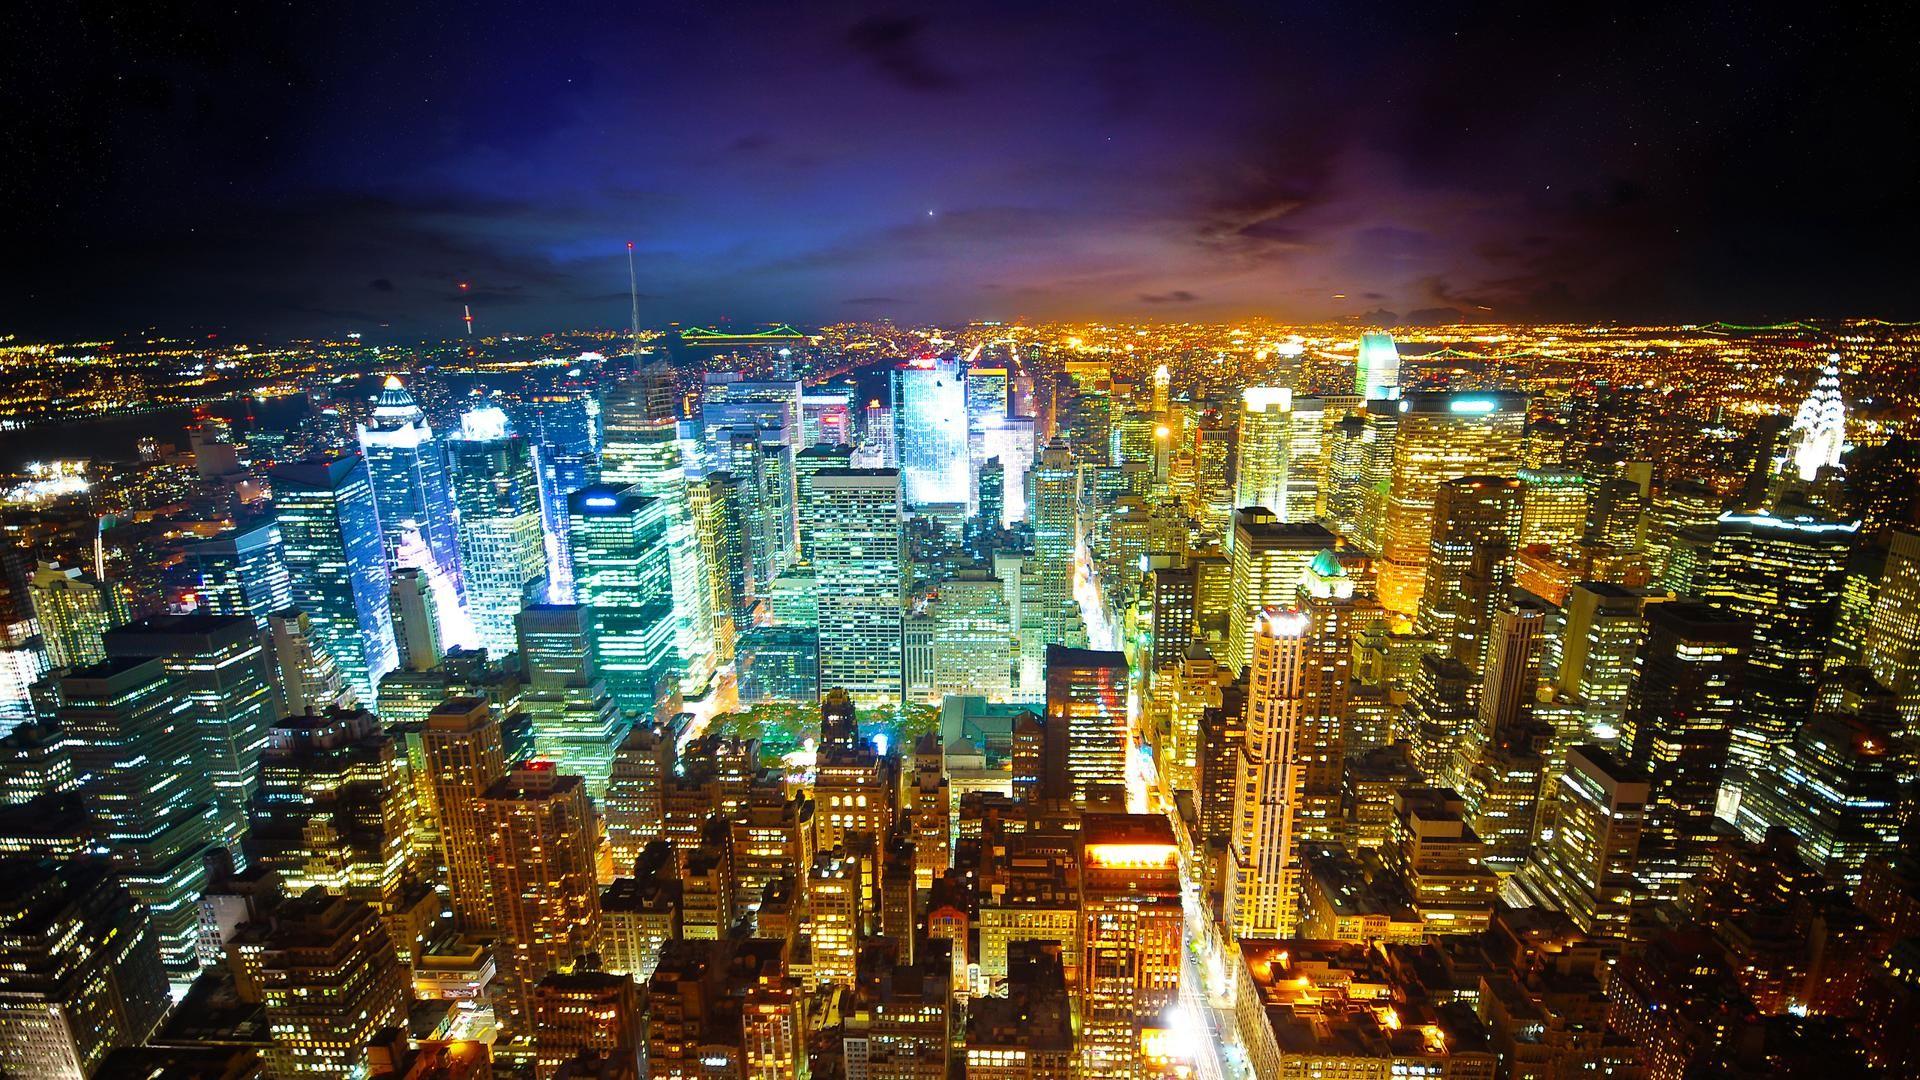 Cool Wallpaper Night Empire State Building - 294806aa3a03eeb4fe6424bd4295e891  2018-378934.jpg